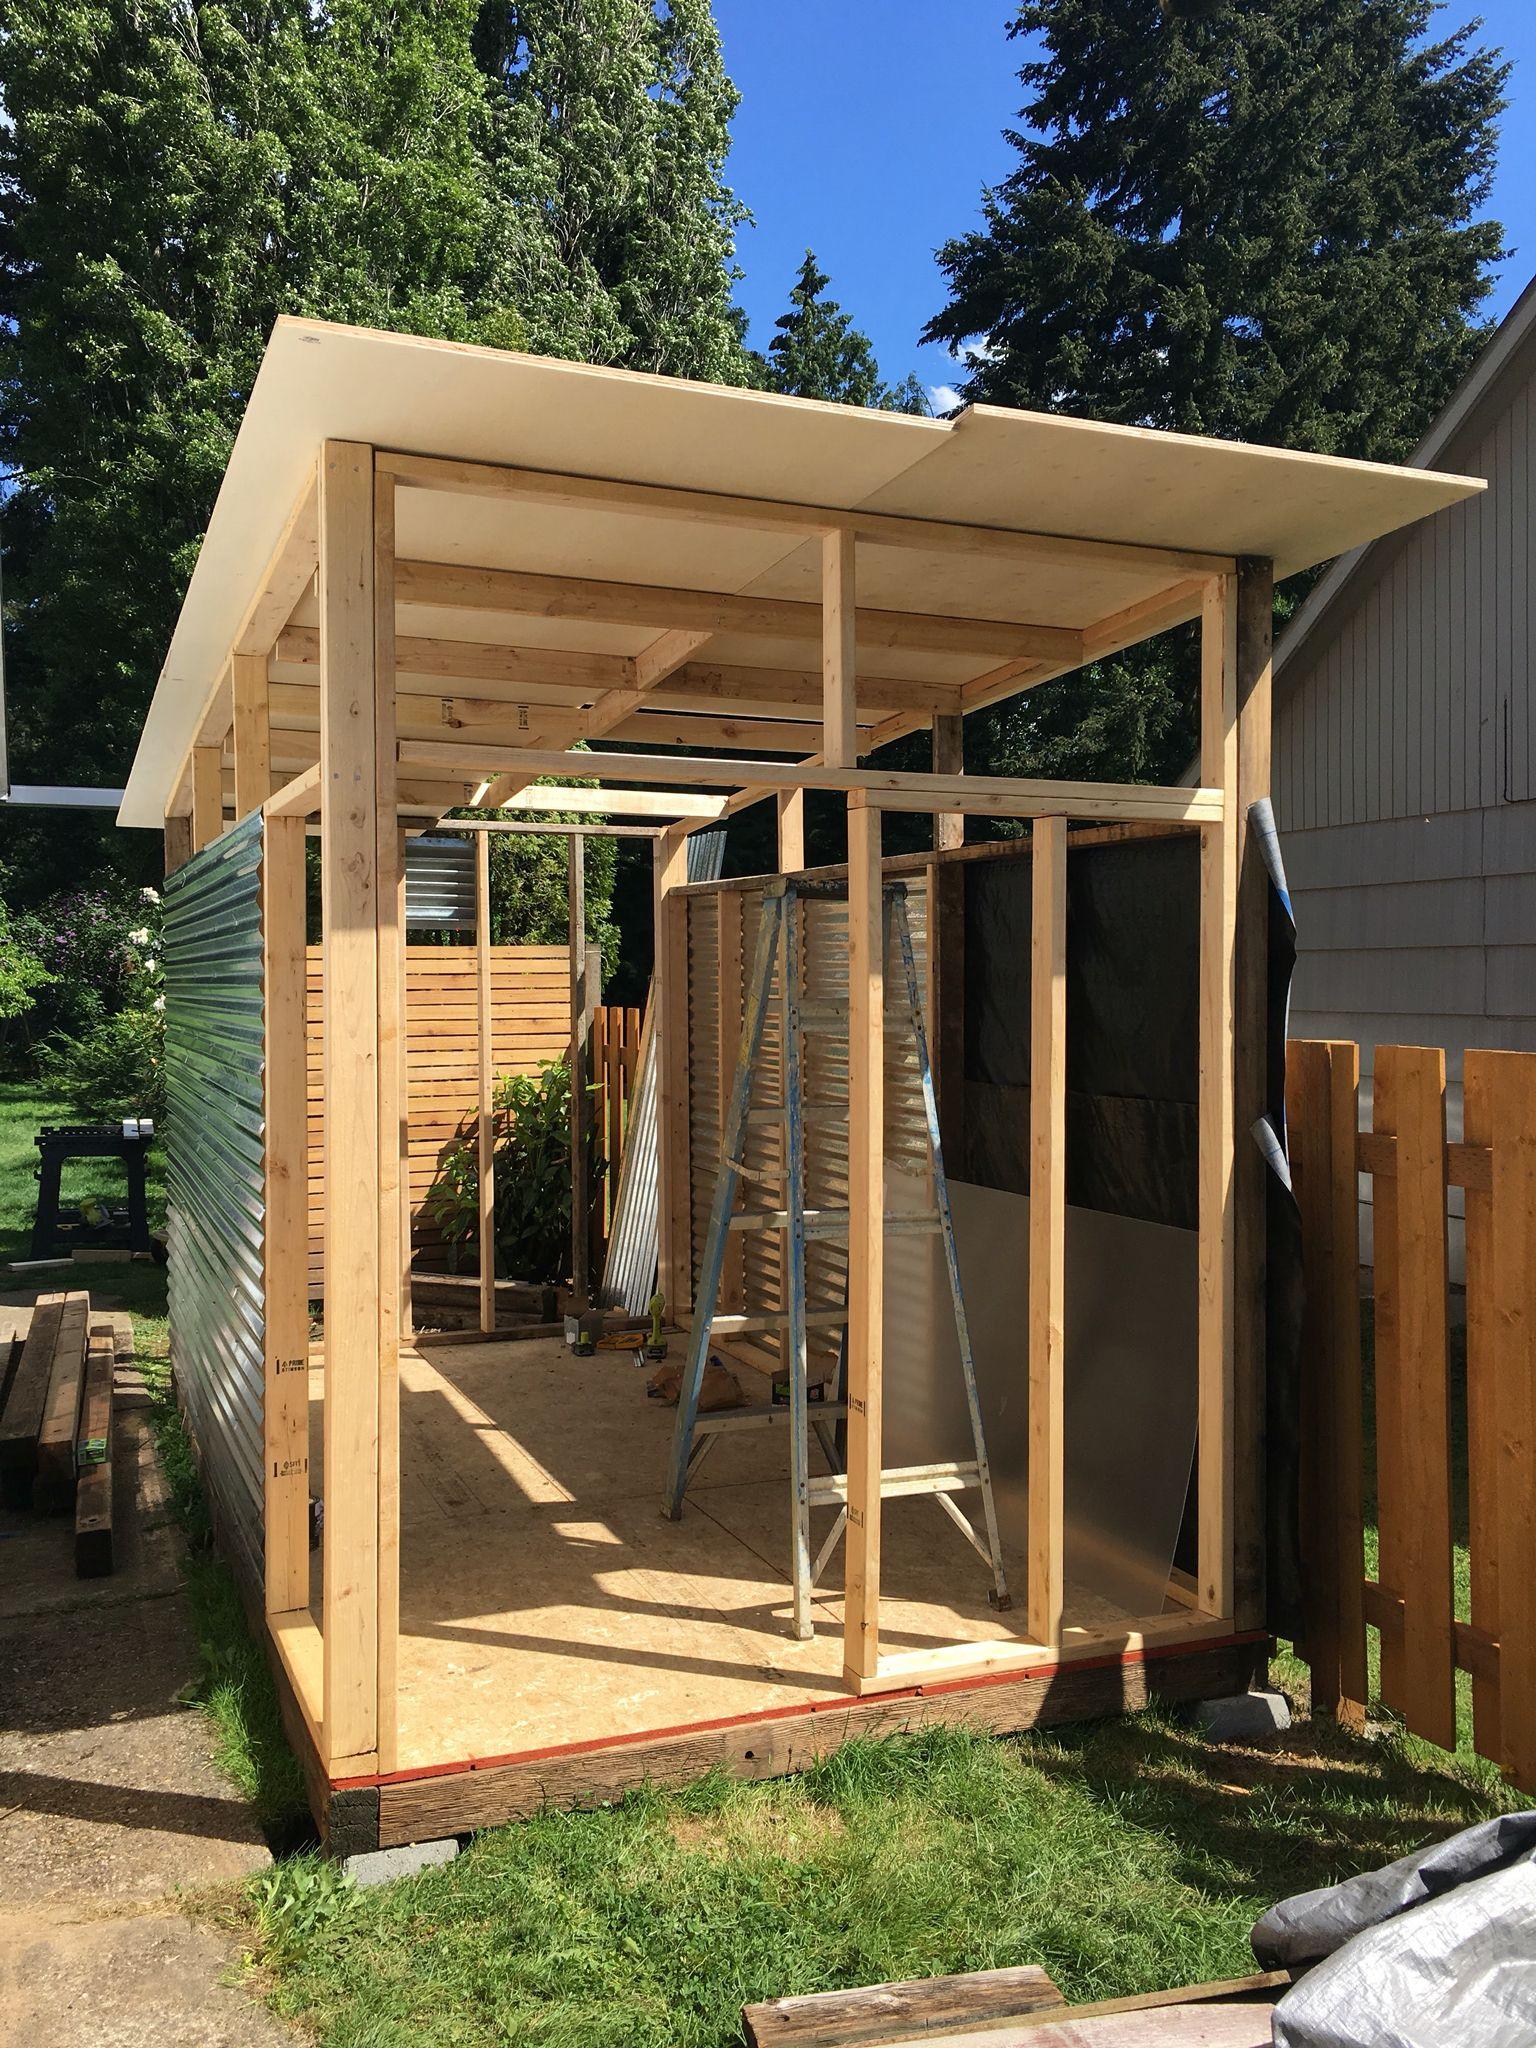 MD100 day 2 of DIY modern shed Sheds Pinterest DIY and